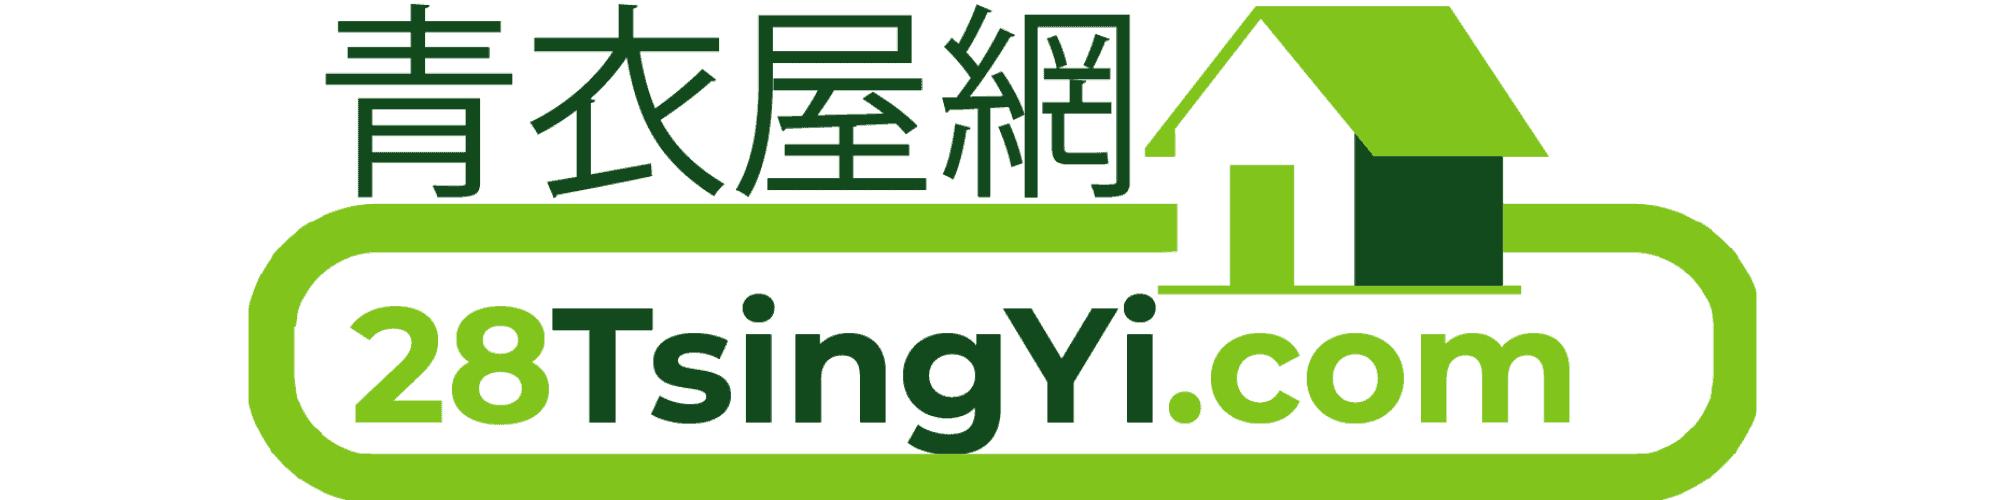 青衣屋網 28TsingYi.com